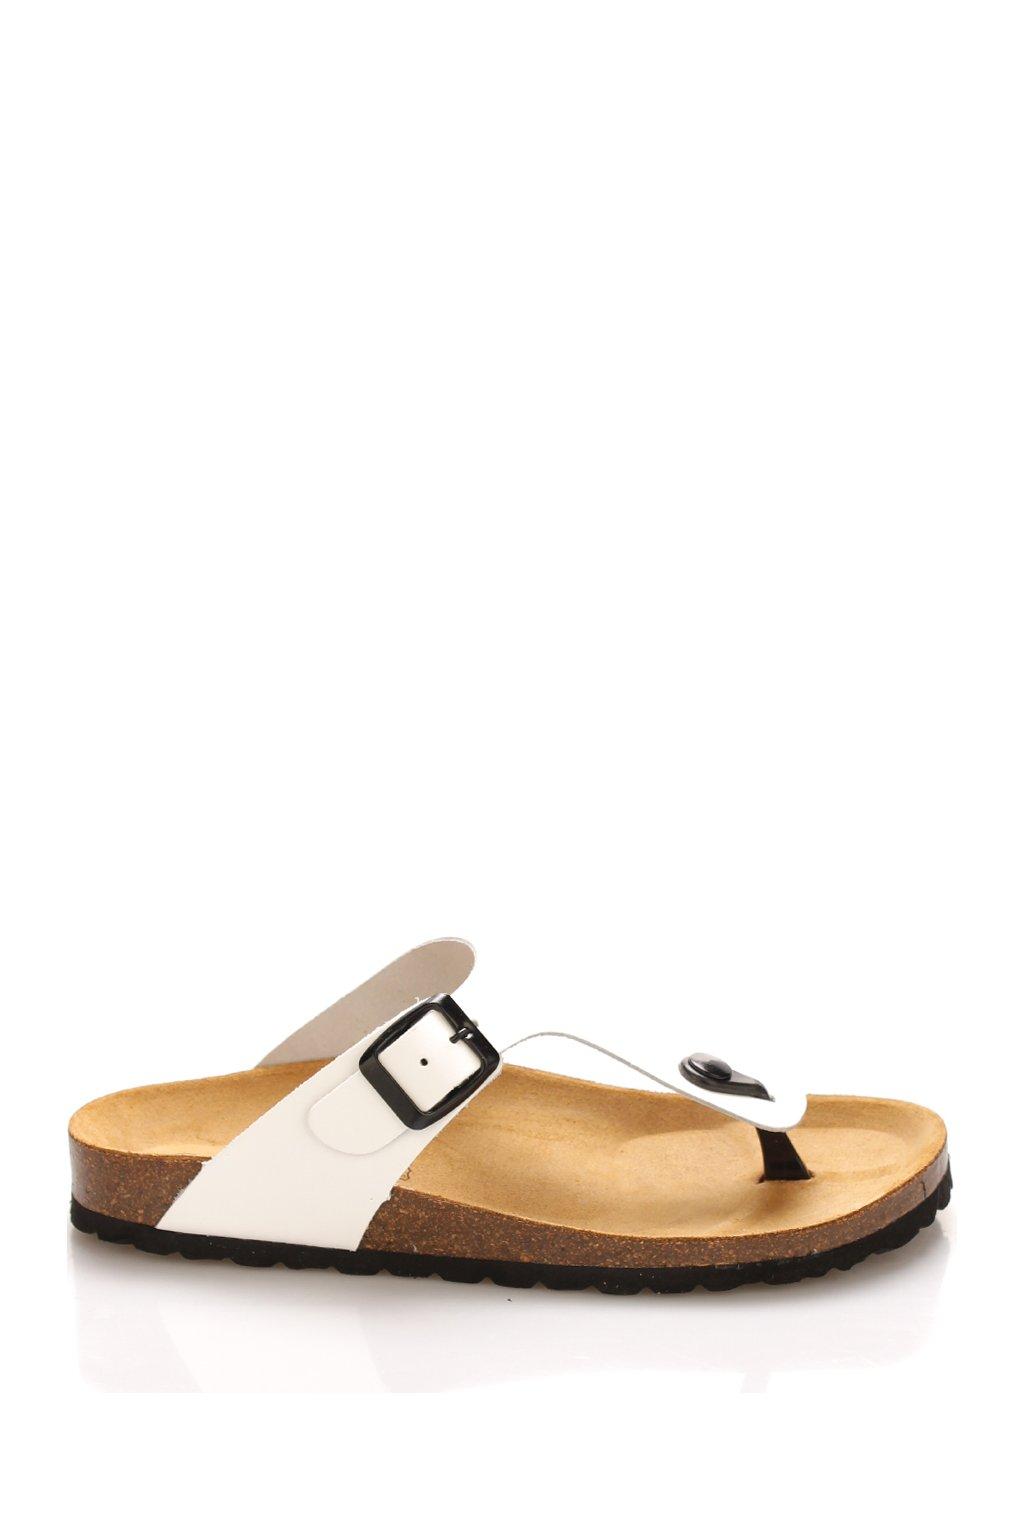 bile kozene zdravotni pantofle emma shoes 21